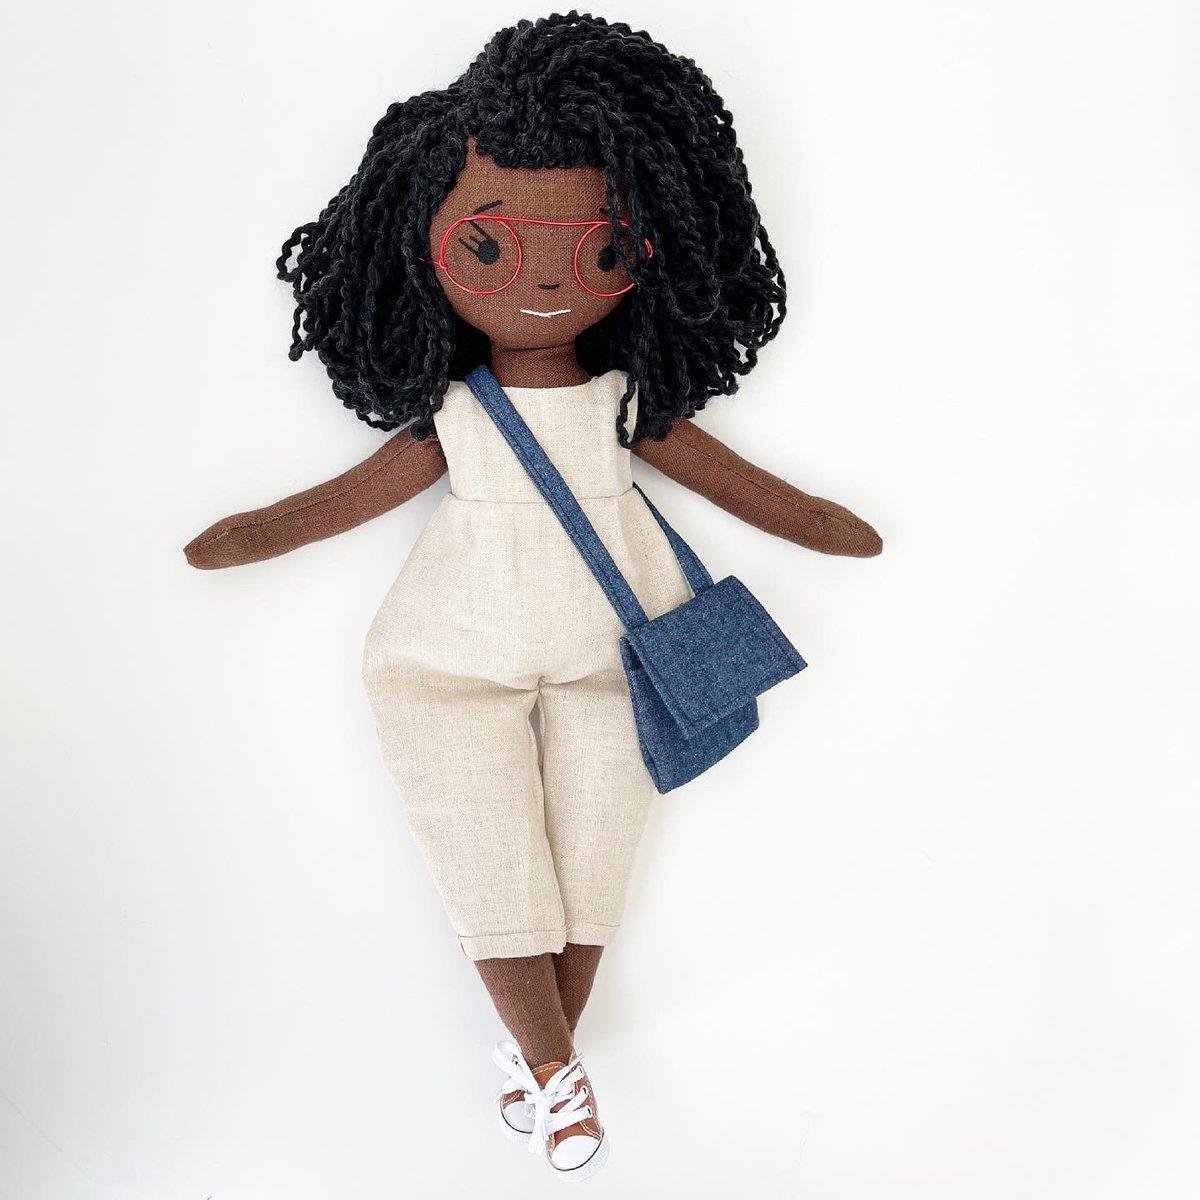 Back to School Brenn Handmade Linen Doll (Waitlist Preorder Item - ship date Oct 1-Mar 30,2022)